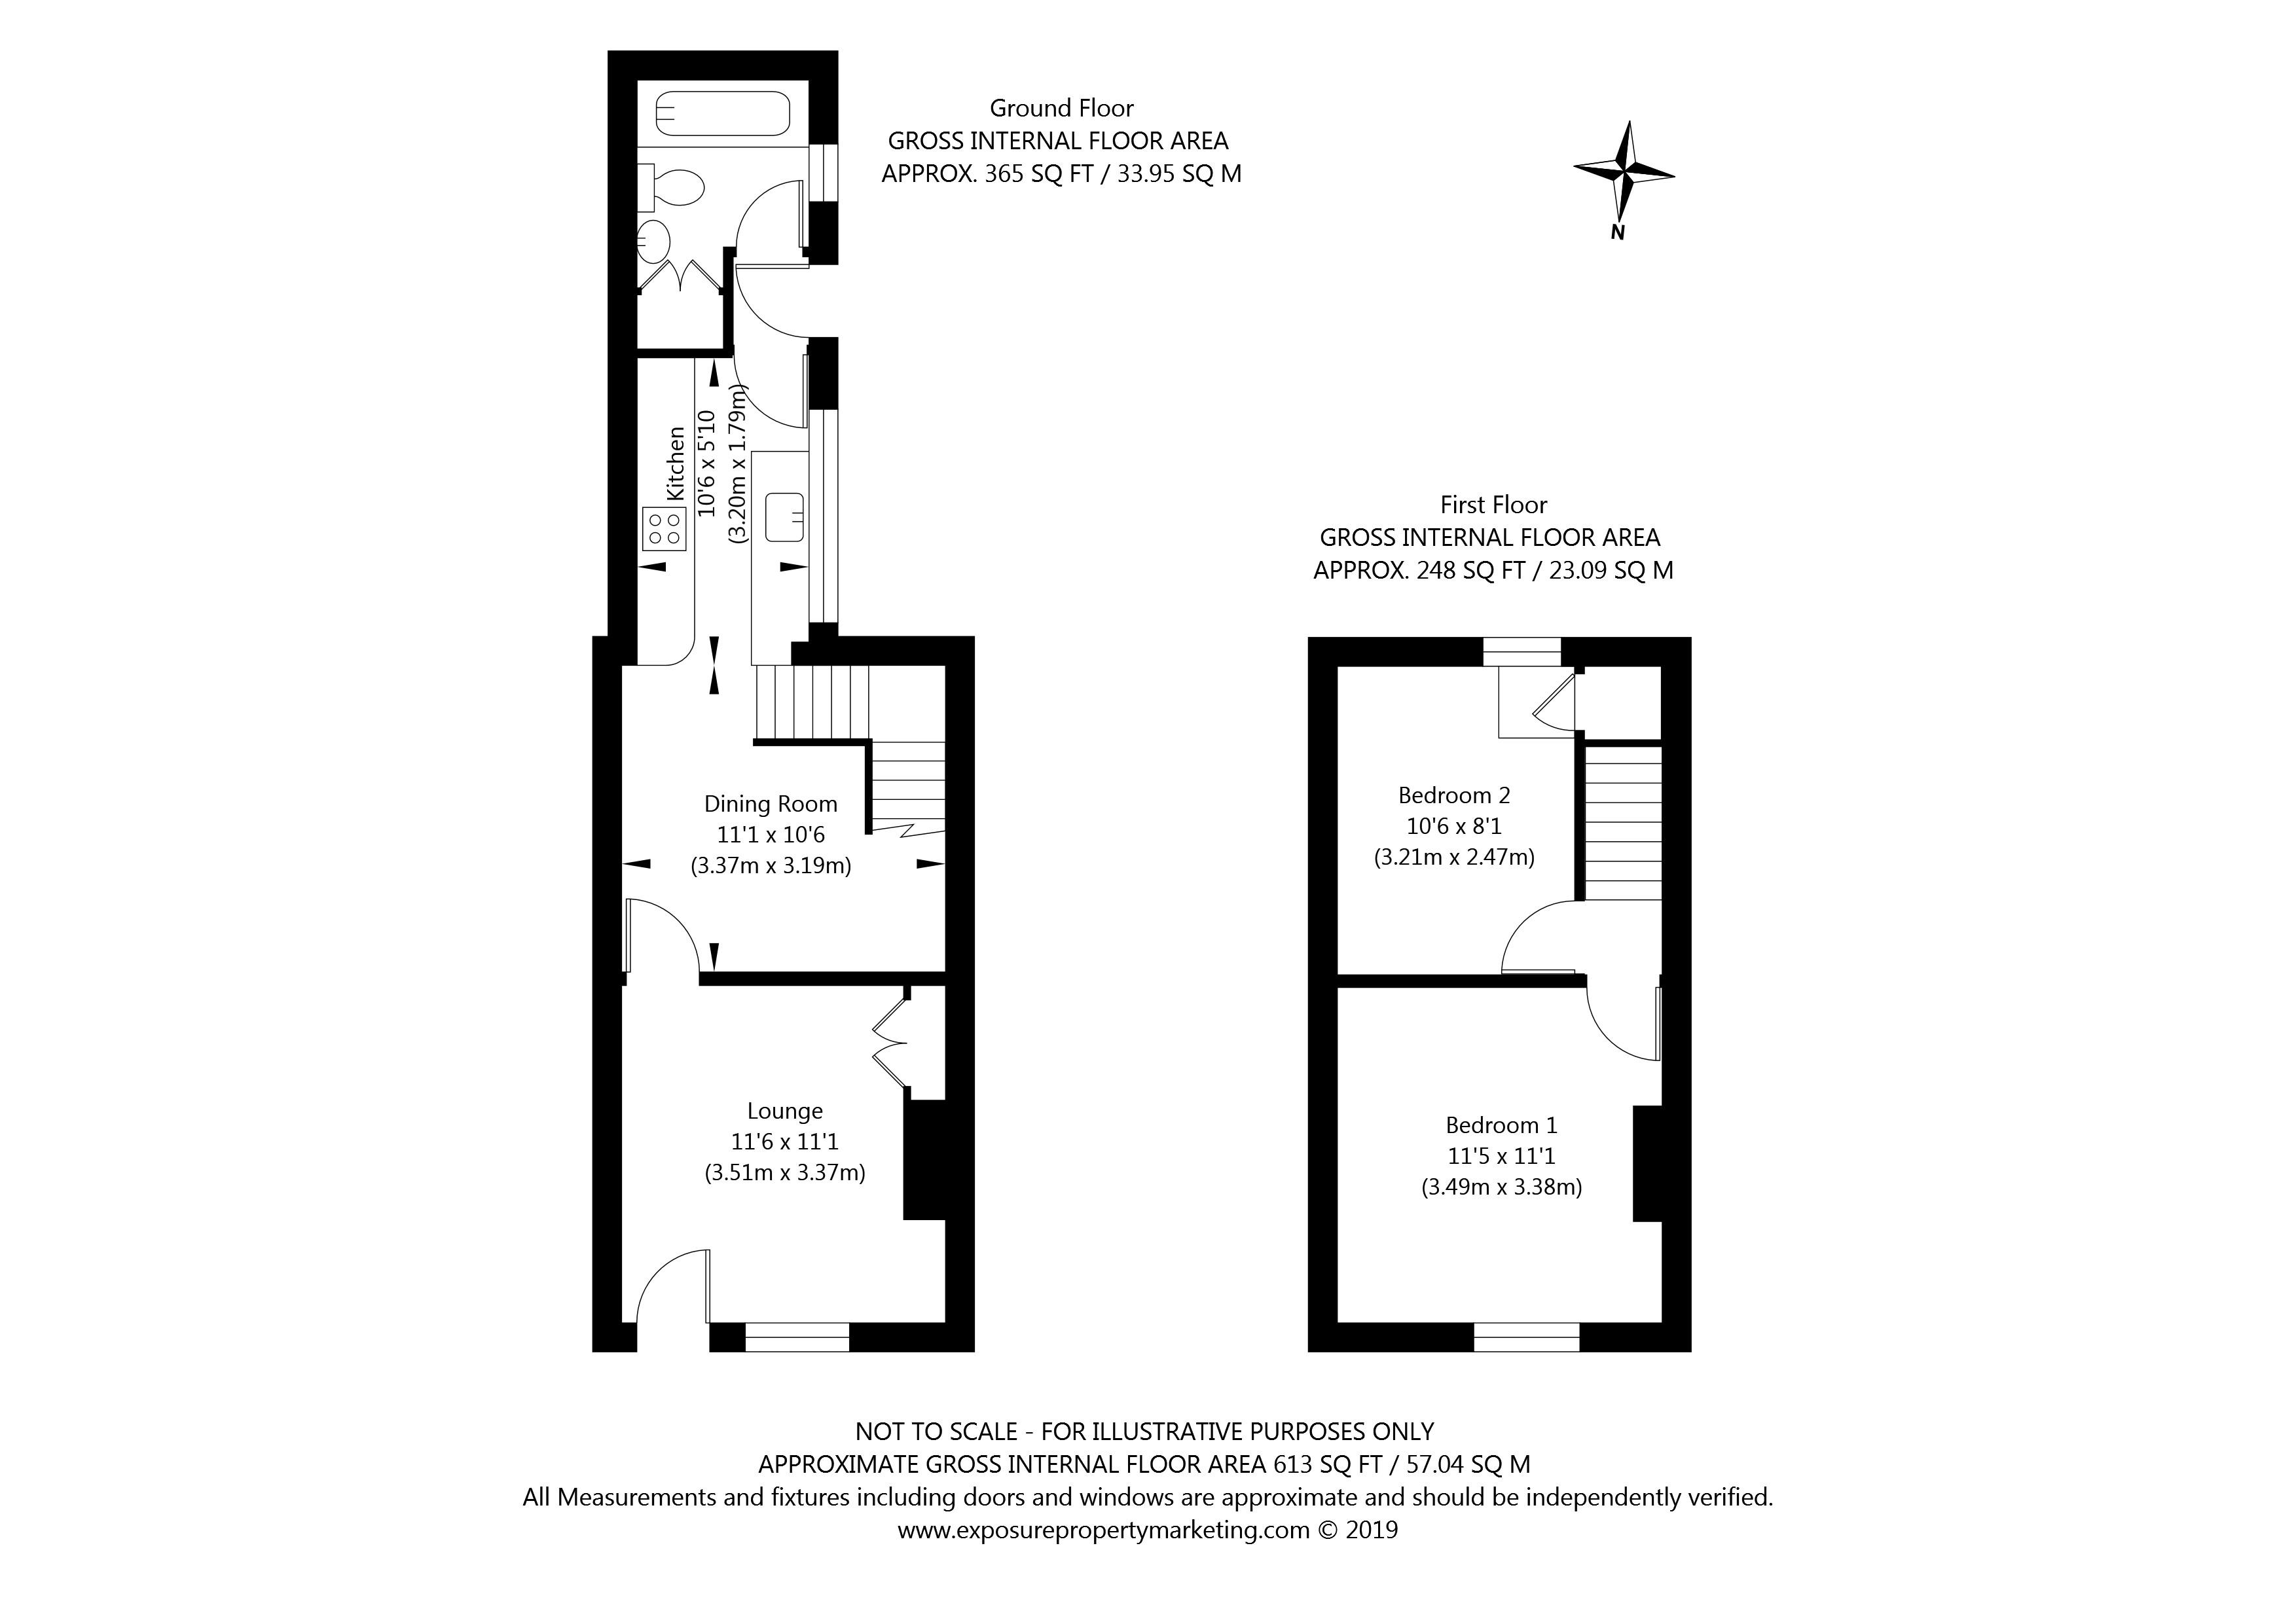 94 Brunswick Street, York property floorplan